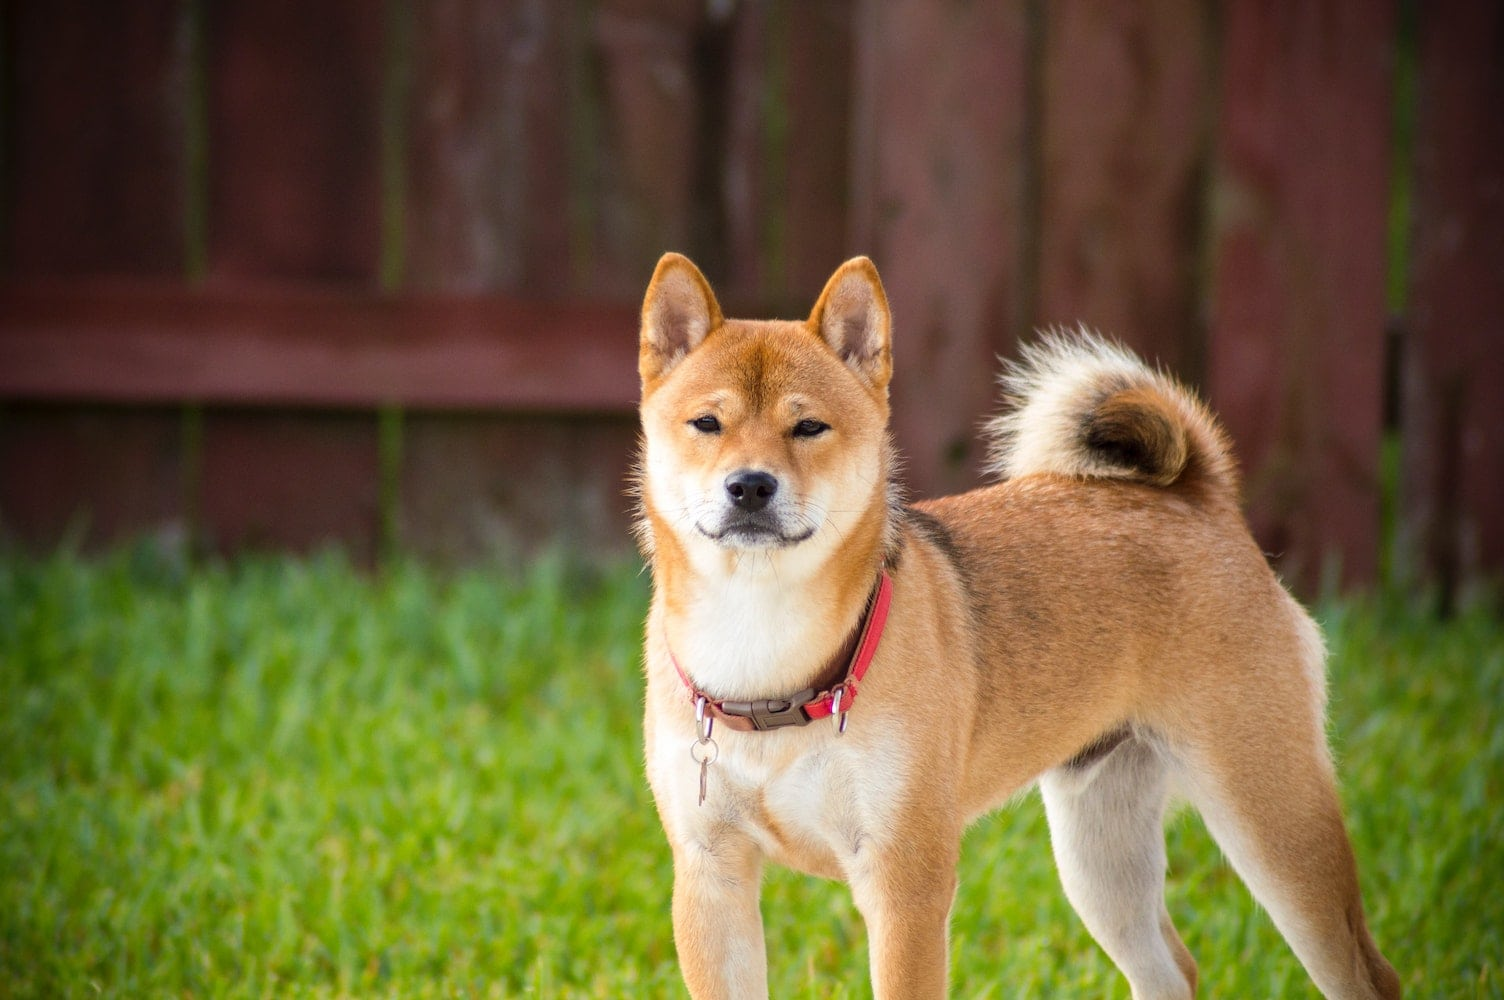 brown dog stood on grass